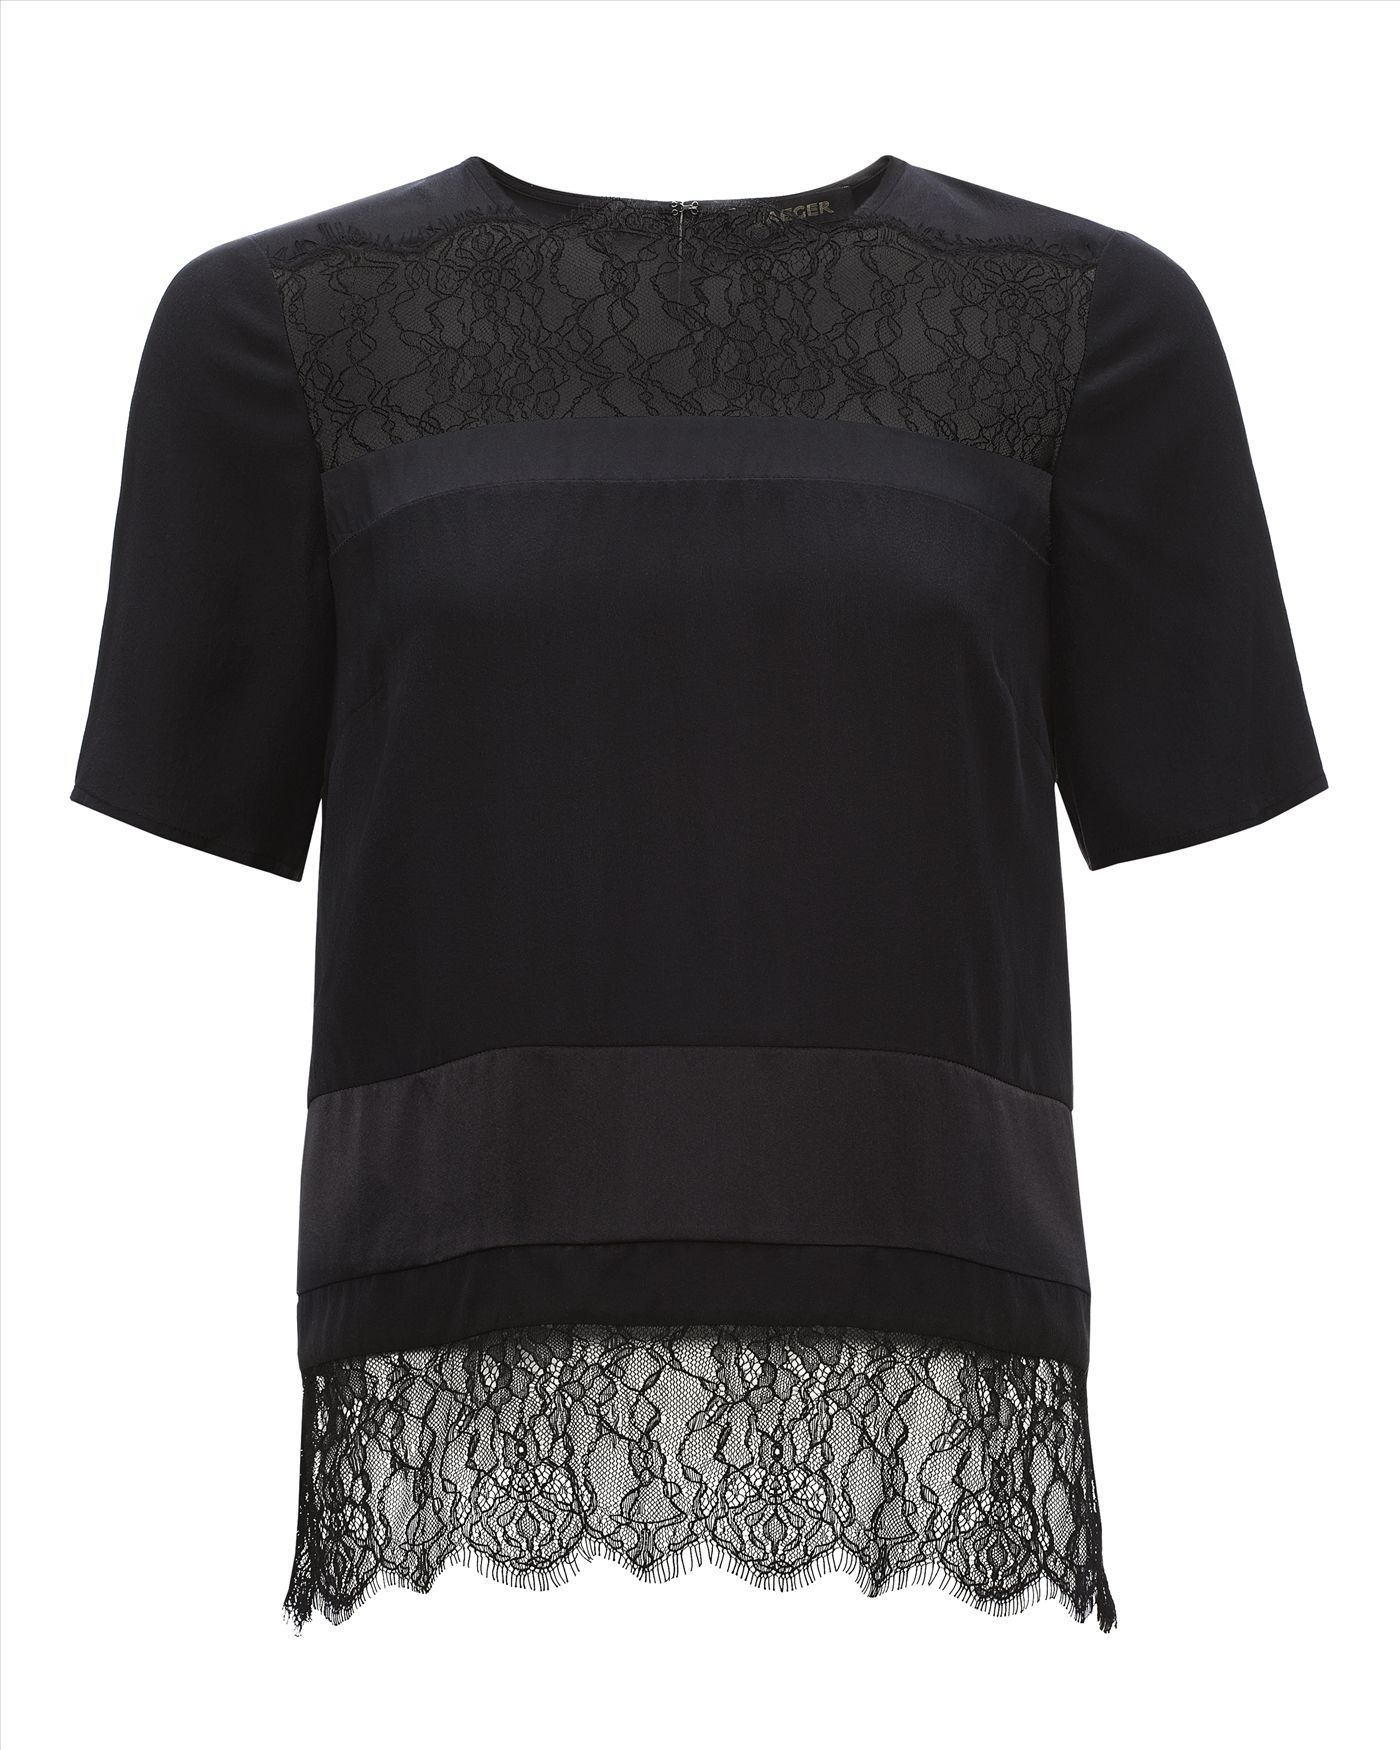 TOPSHOP Organza Dress in Black - Lyst